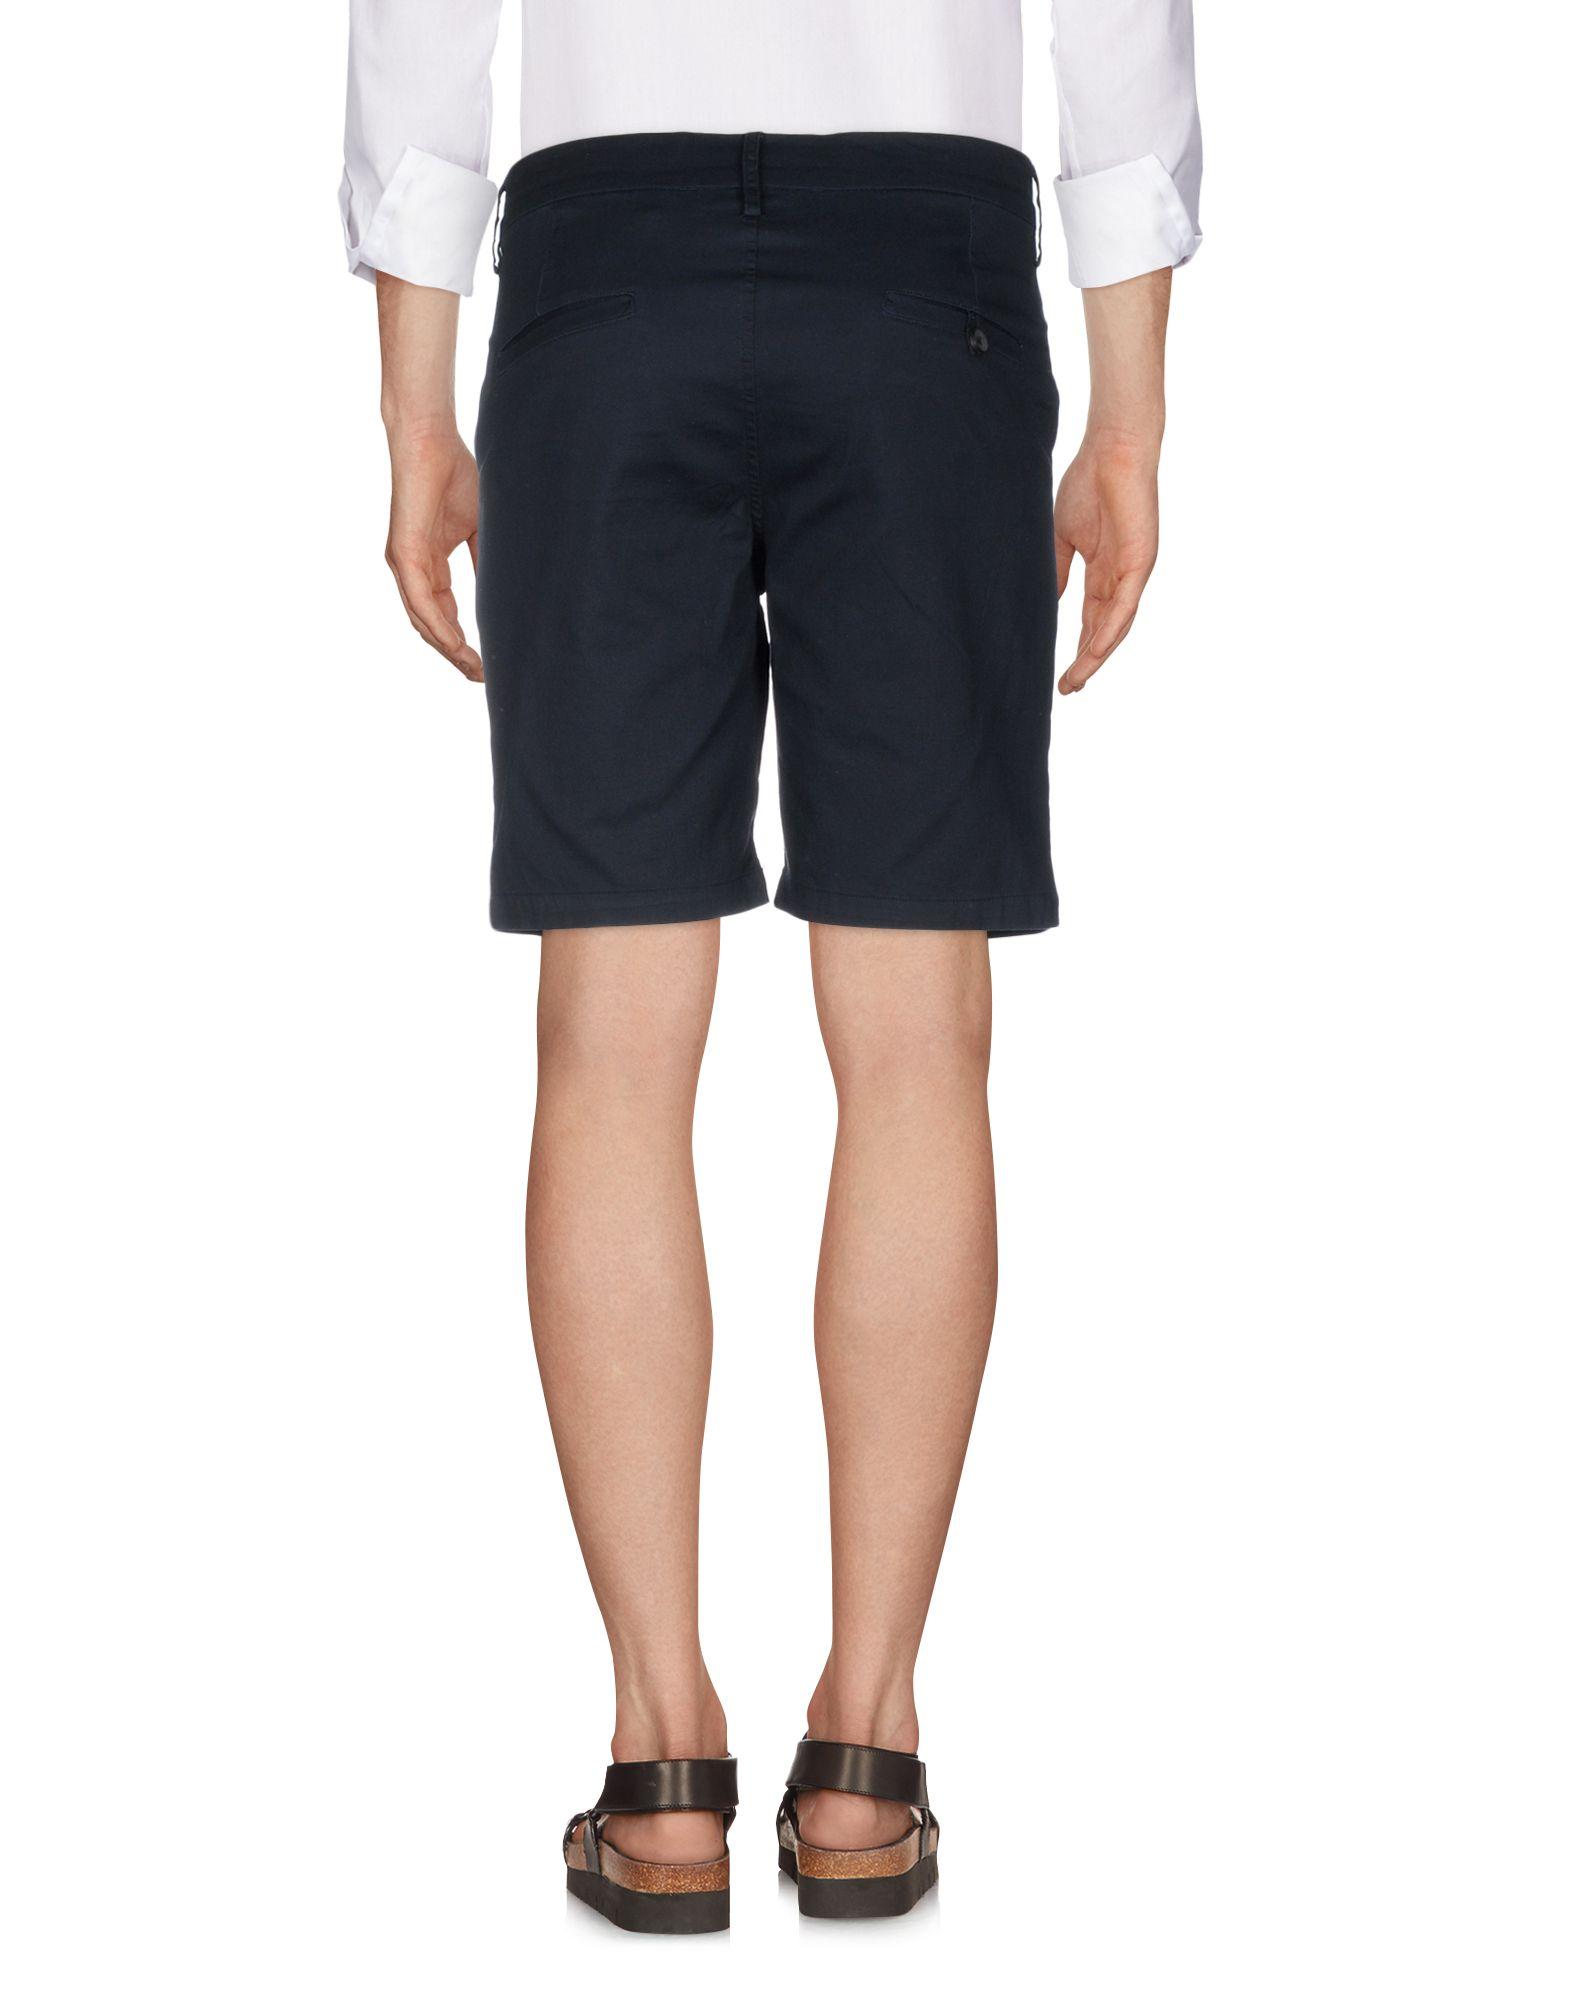 Shorts Shorts Shorts & Bermuda Anerkjendt Uomo - 13124878IG b5c18f